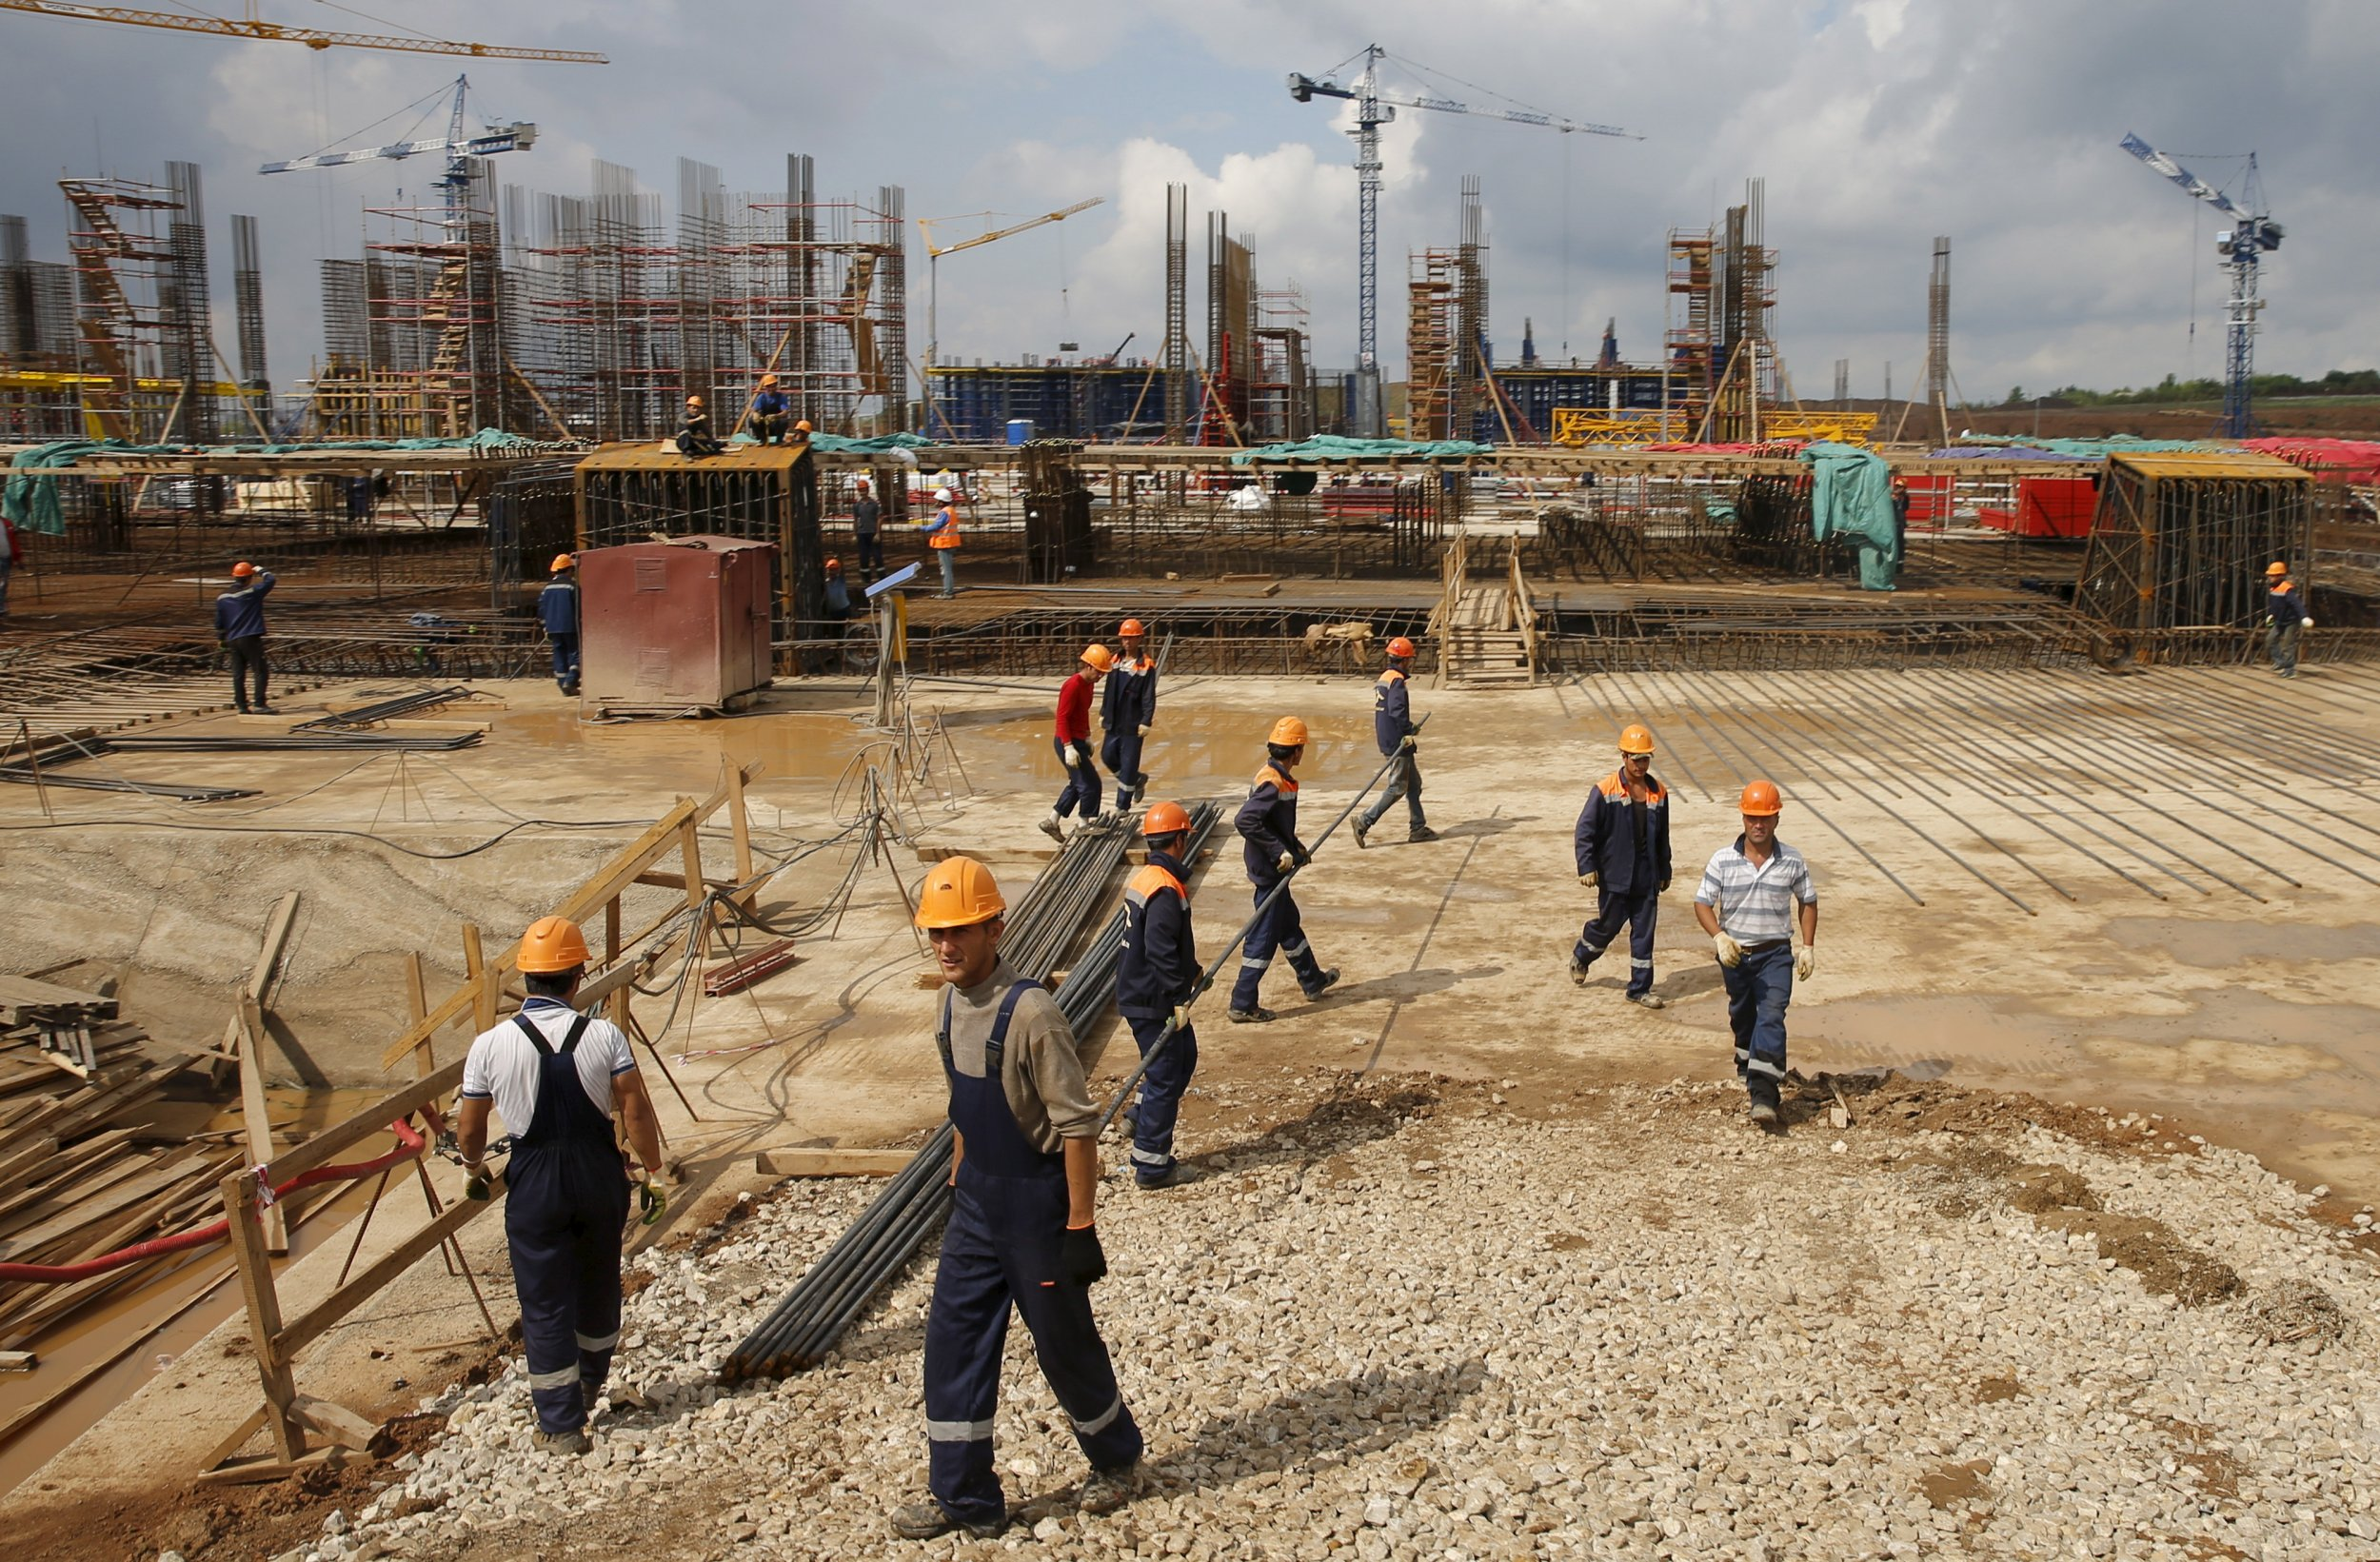 Samara football stadium being constructed